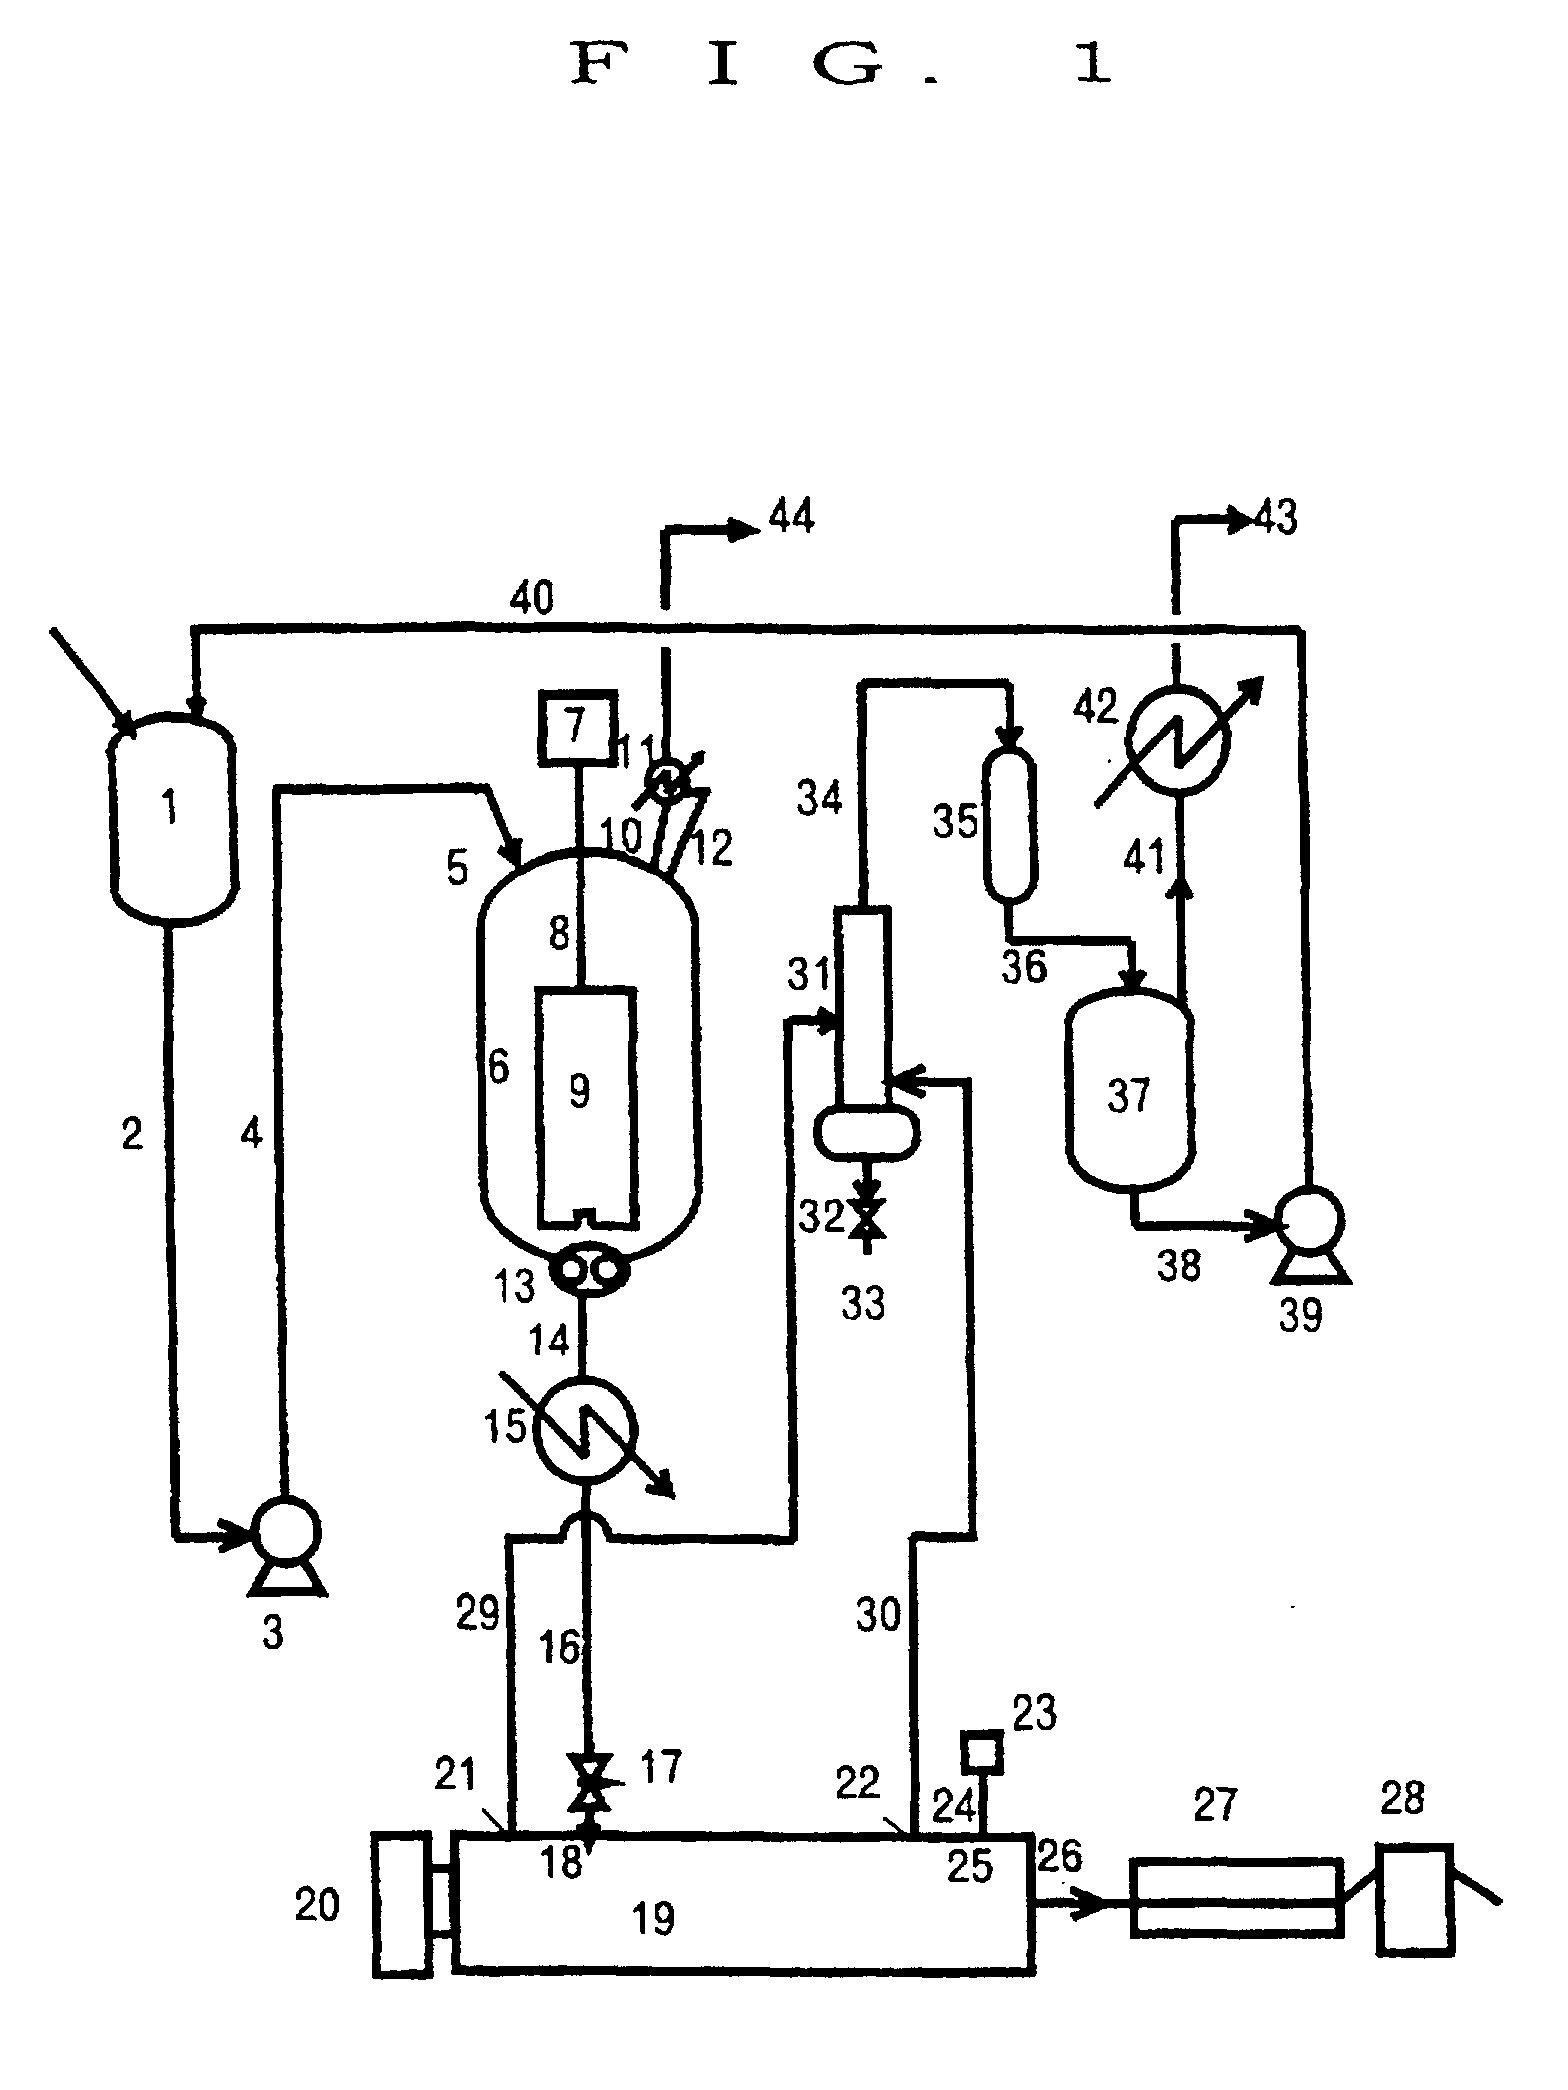 styrene production process flow diagram dual wiring methyl methacrylate 28 images